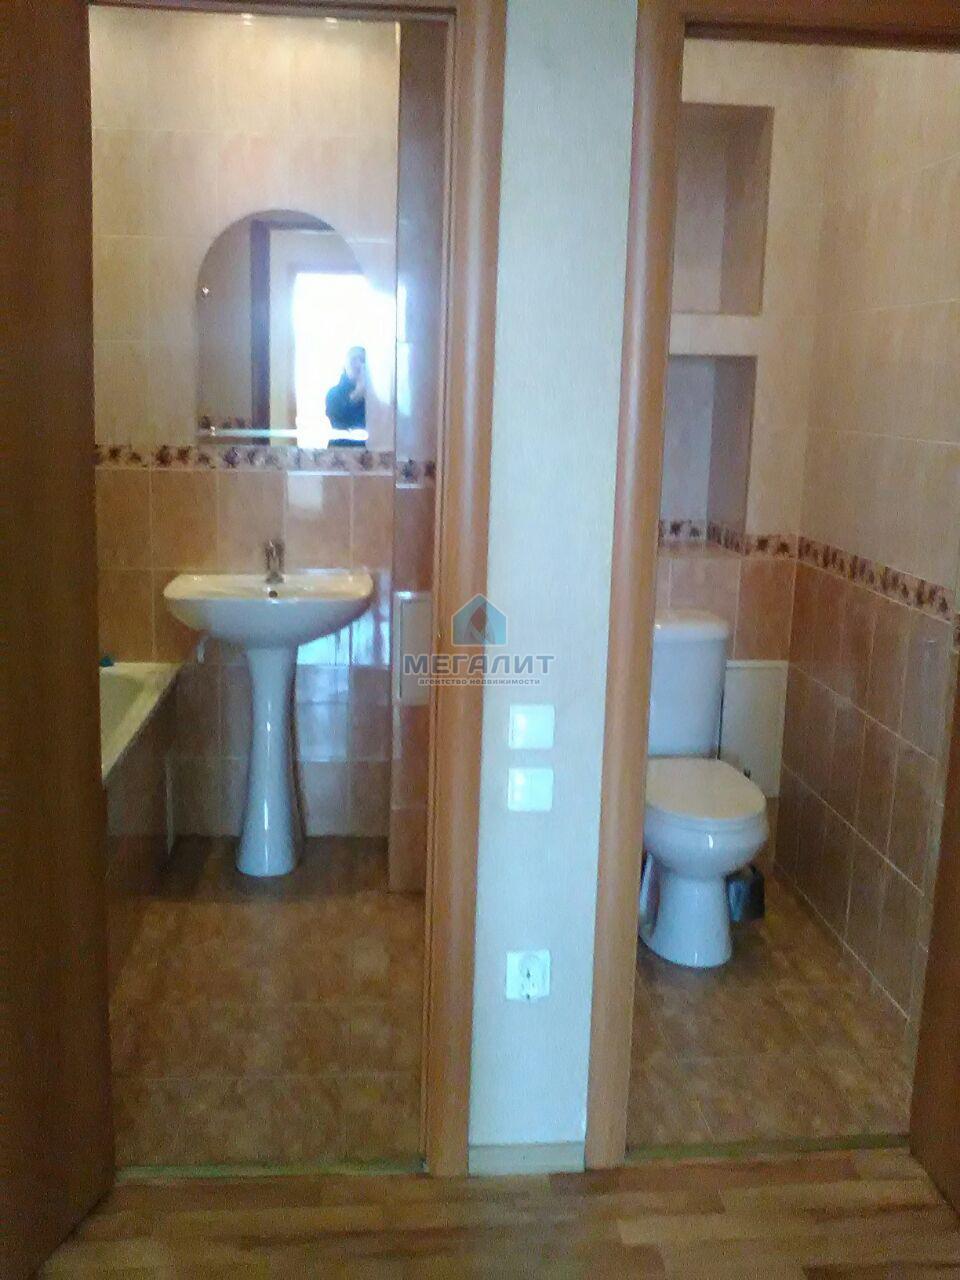 Аренда 2-к квартиры Меридианная 3, 70.0 м² (миниатюра №2)